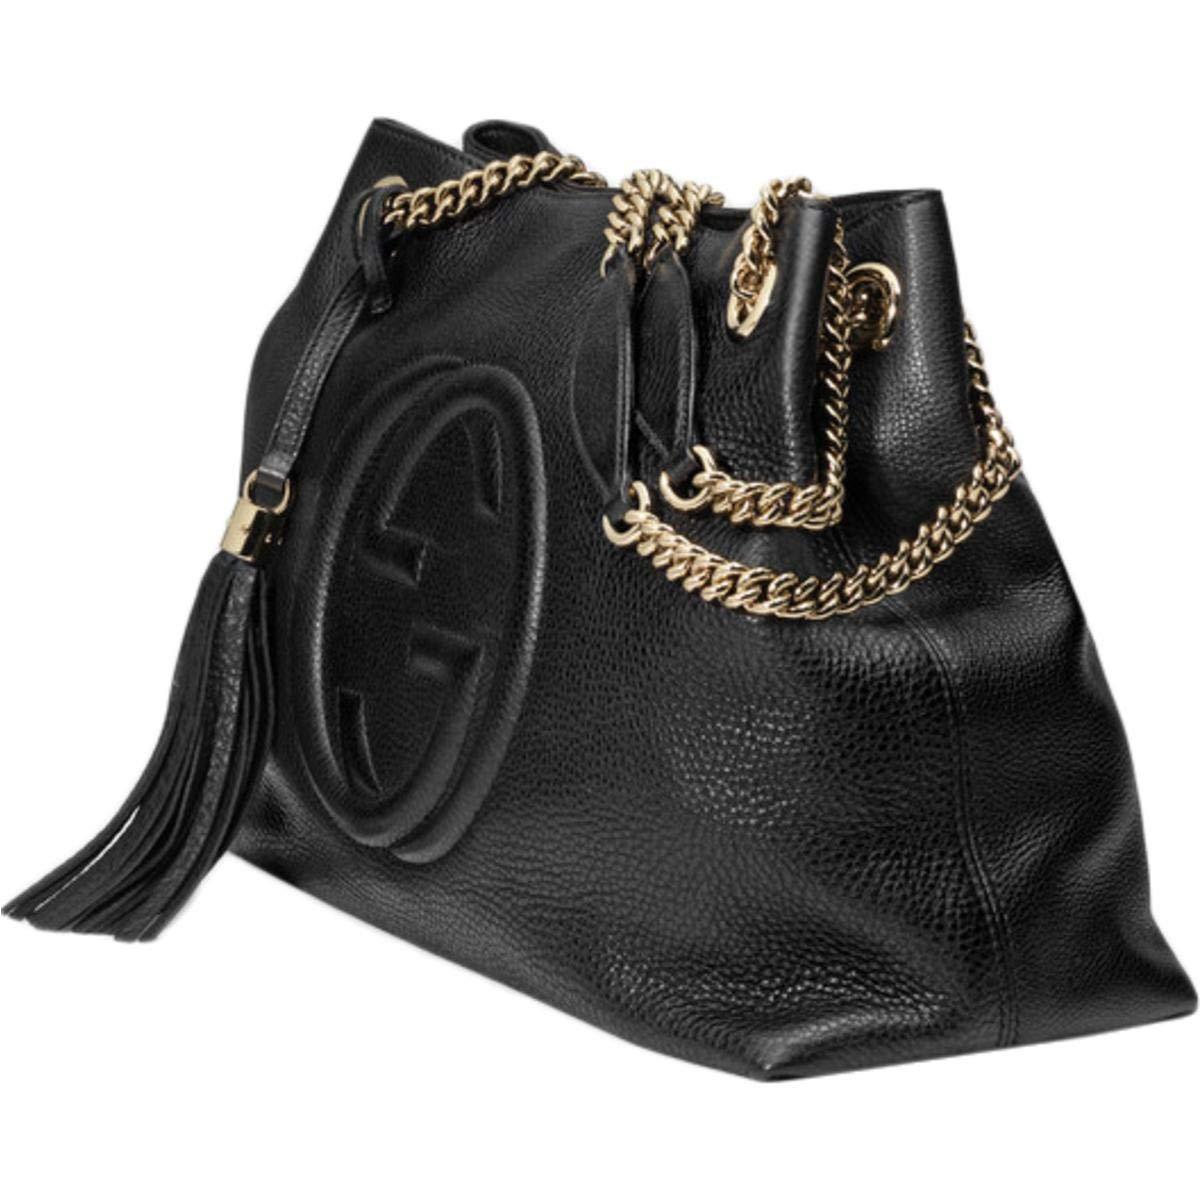 e7f826486 Amazon.com: Gucci Soho Large Leather Chain Shoulder Handbag Black BHFO  5480: Shoes